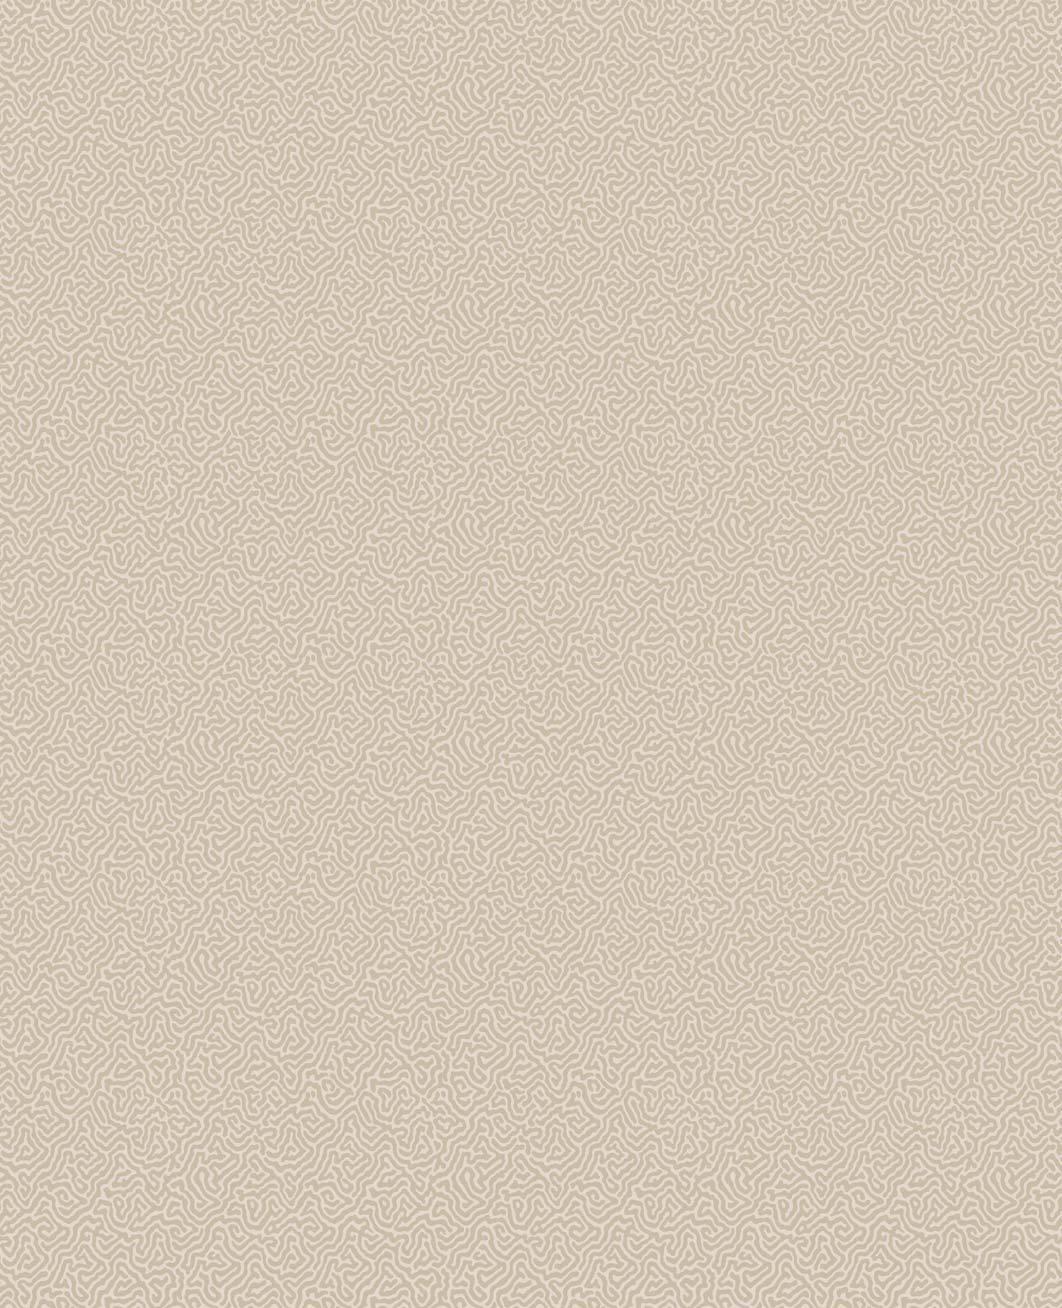 Обои Cole & Son Landscape Plains 106/5070, интернет магазин Волео